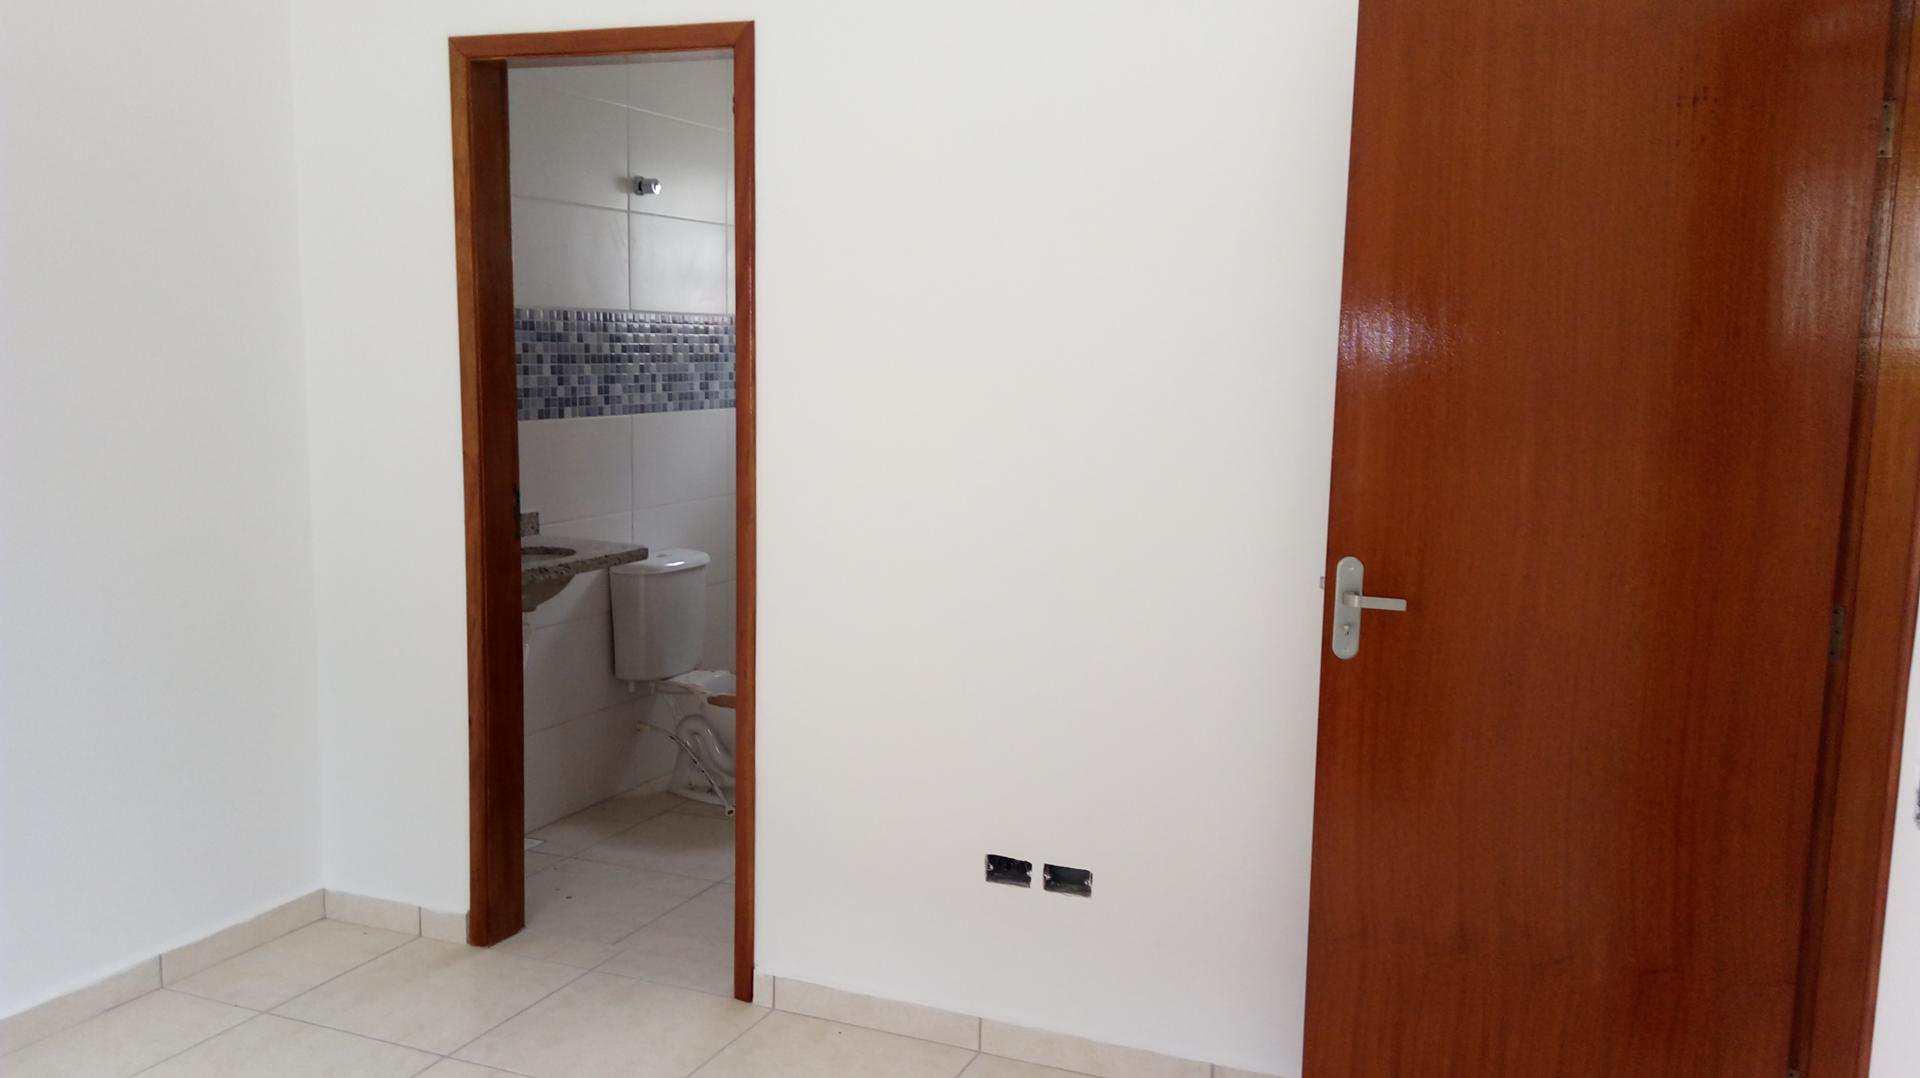 Casa de Condomínio com 3 dorms, Cibratel II, Itanhaém - R$ 290 mil, Cod: 5202